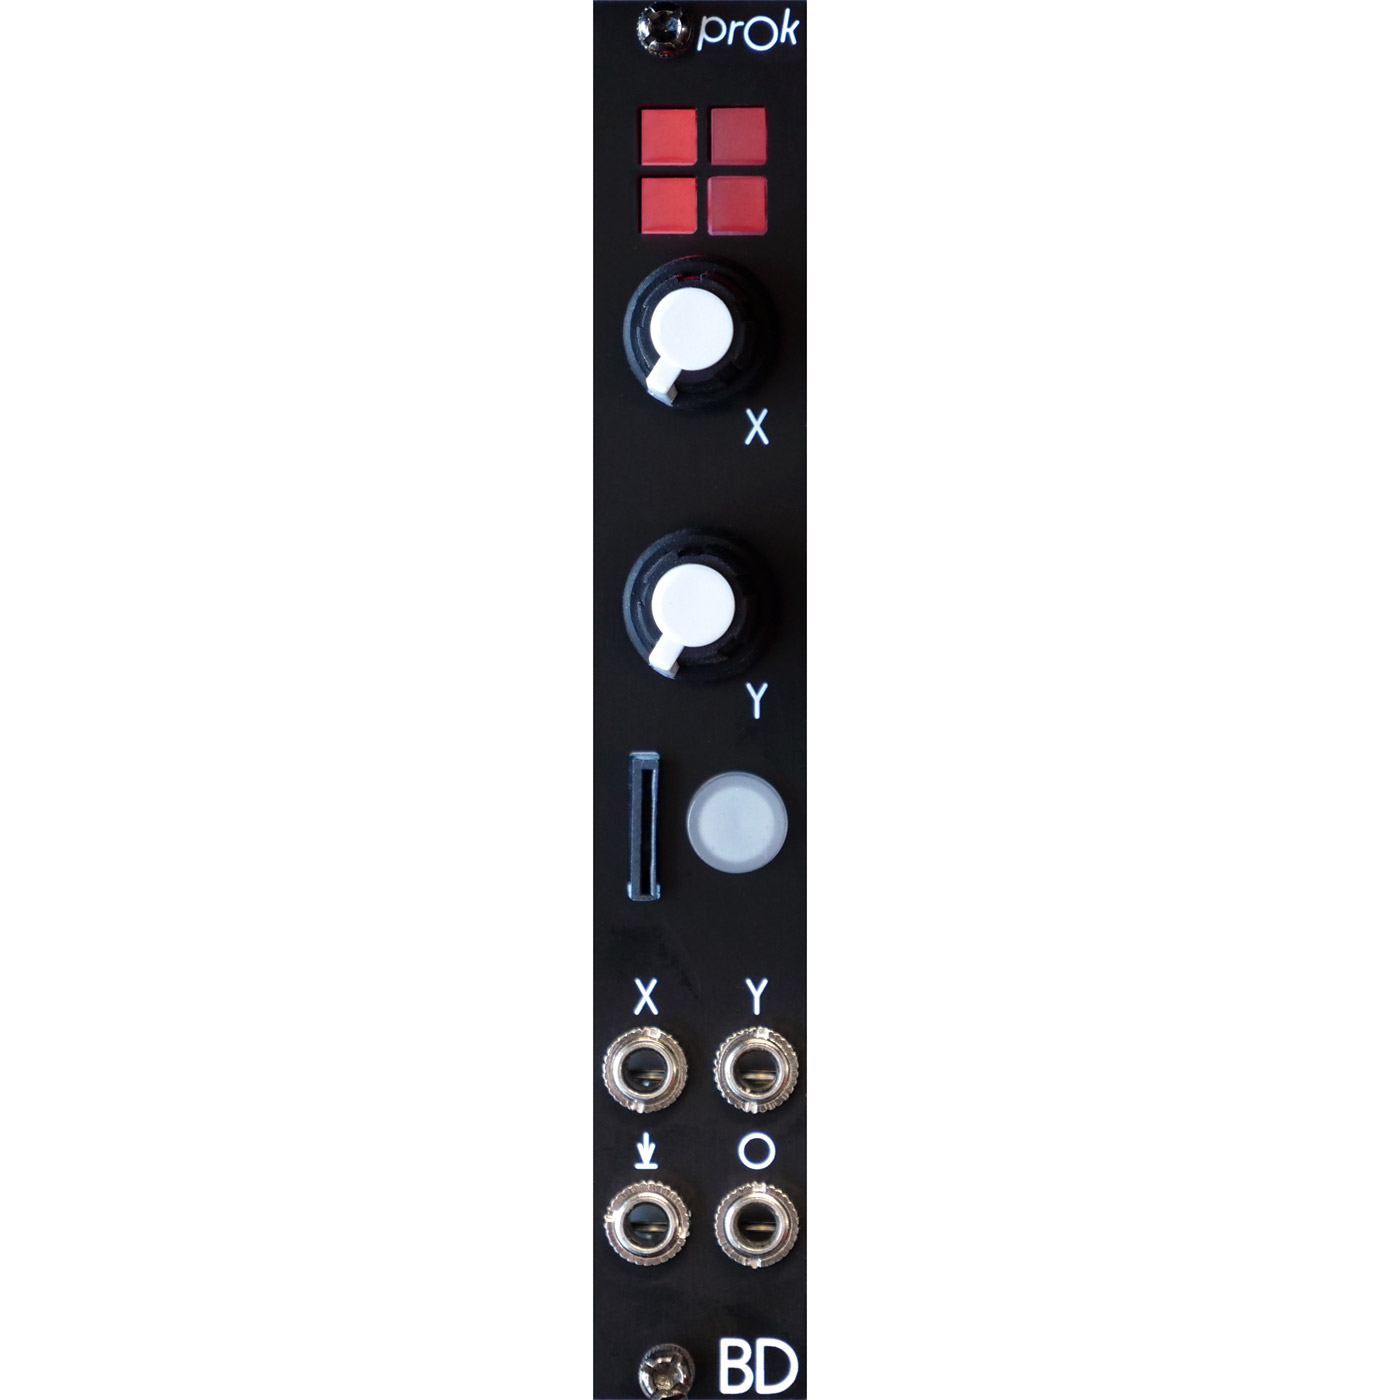 prok bassdrum full diy kit thonk diy synthesizer kits components. Black Bedroom Furniture Sets. Home Design Ideas